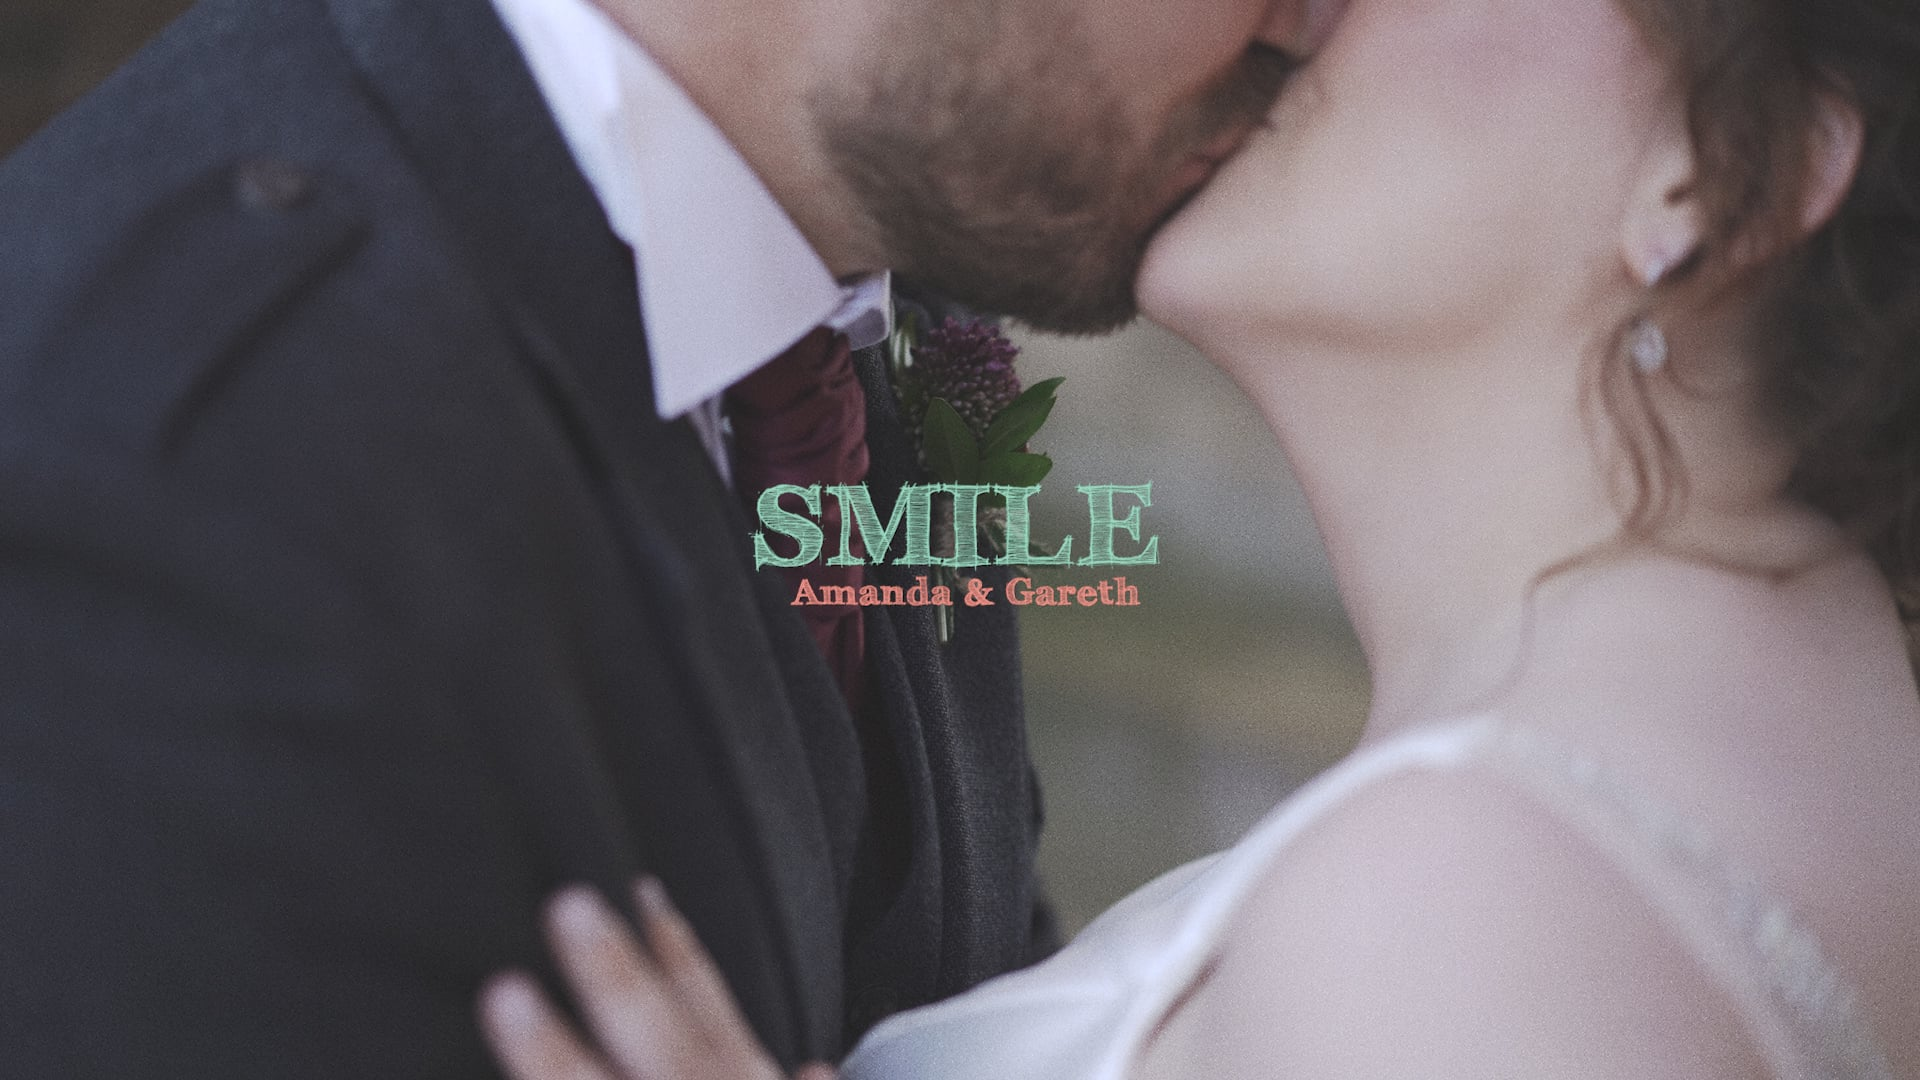 Smile by Amanda and Gareth